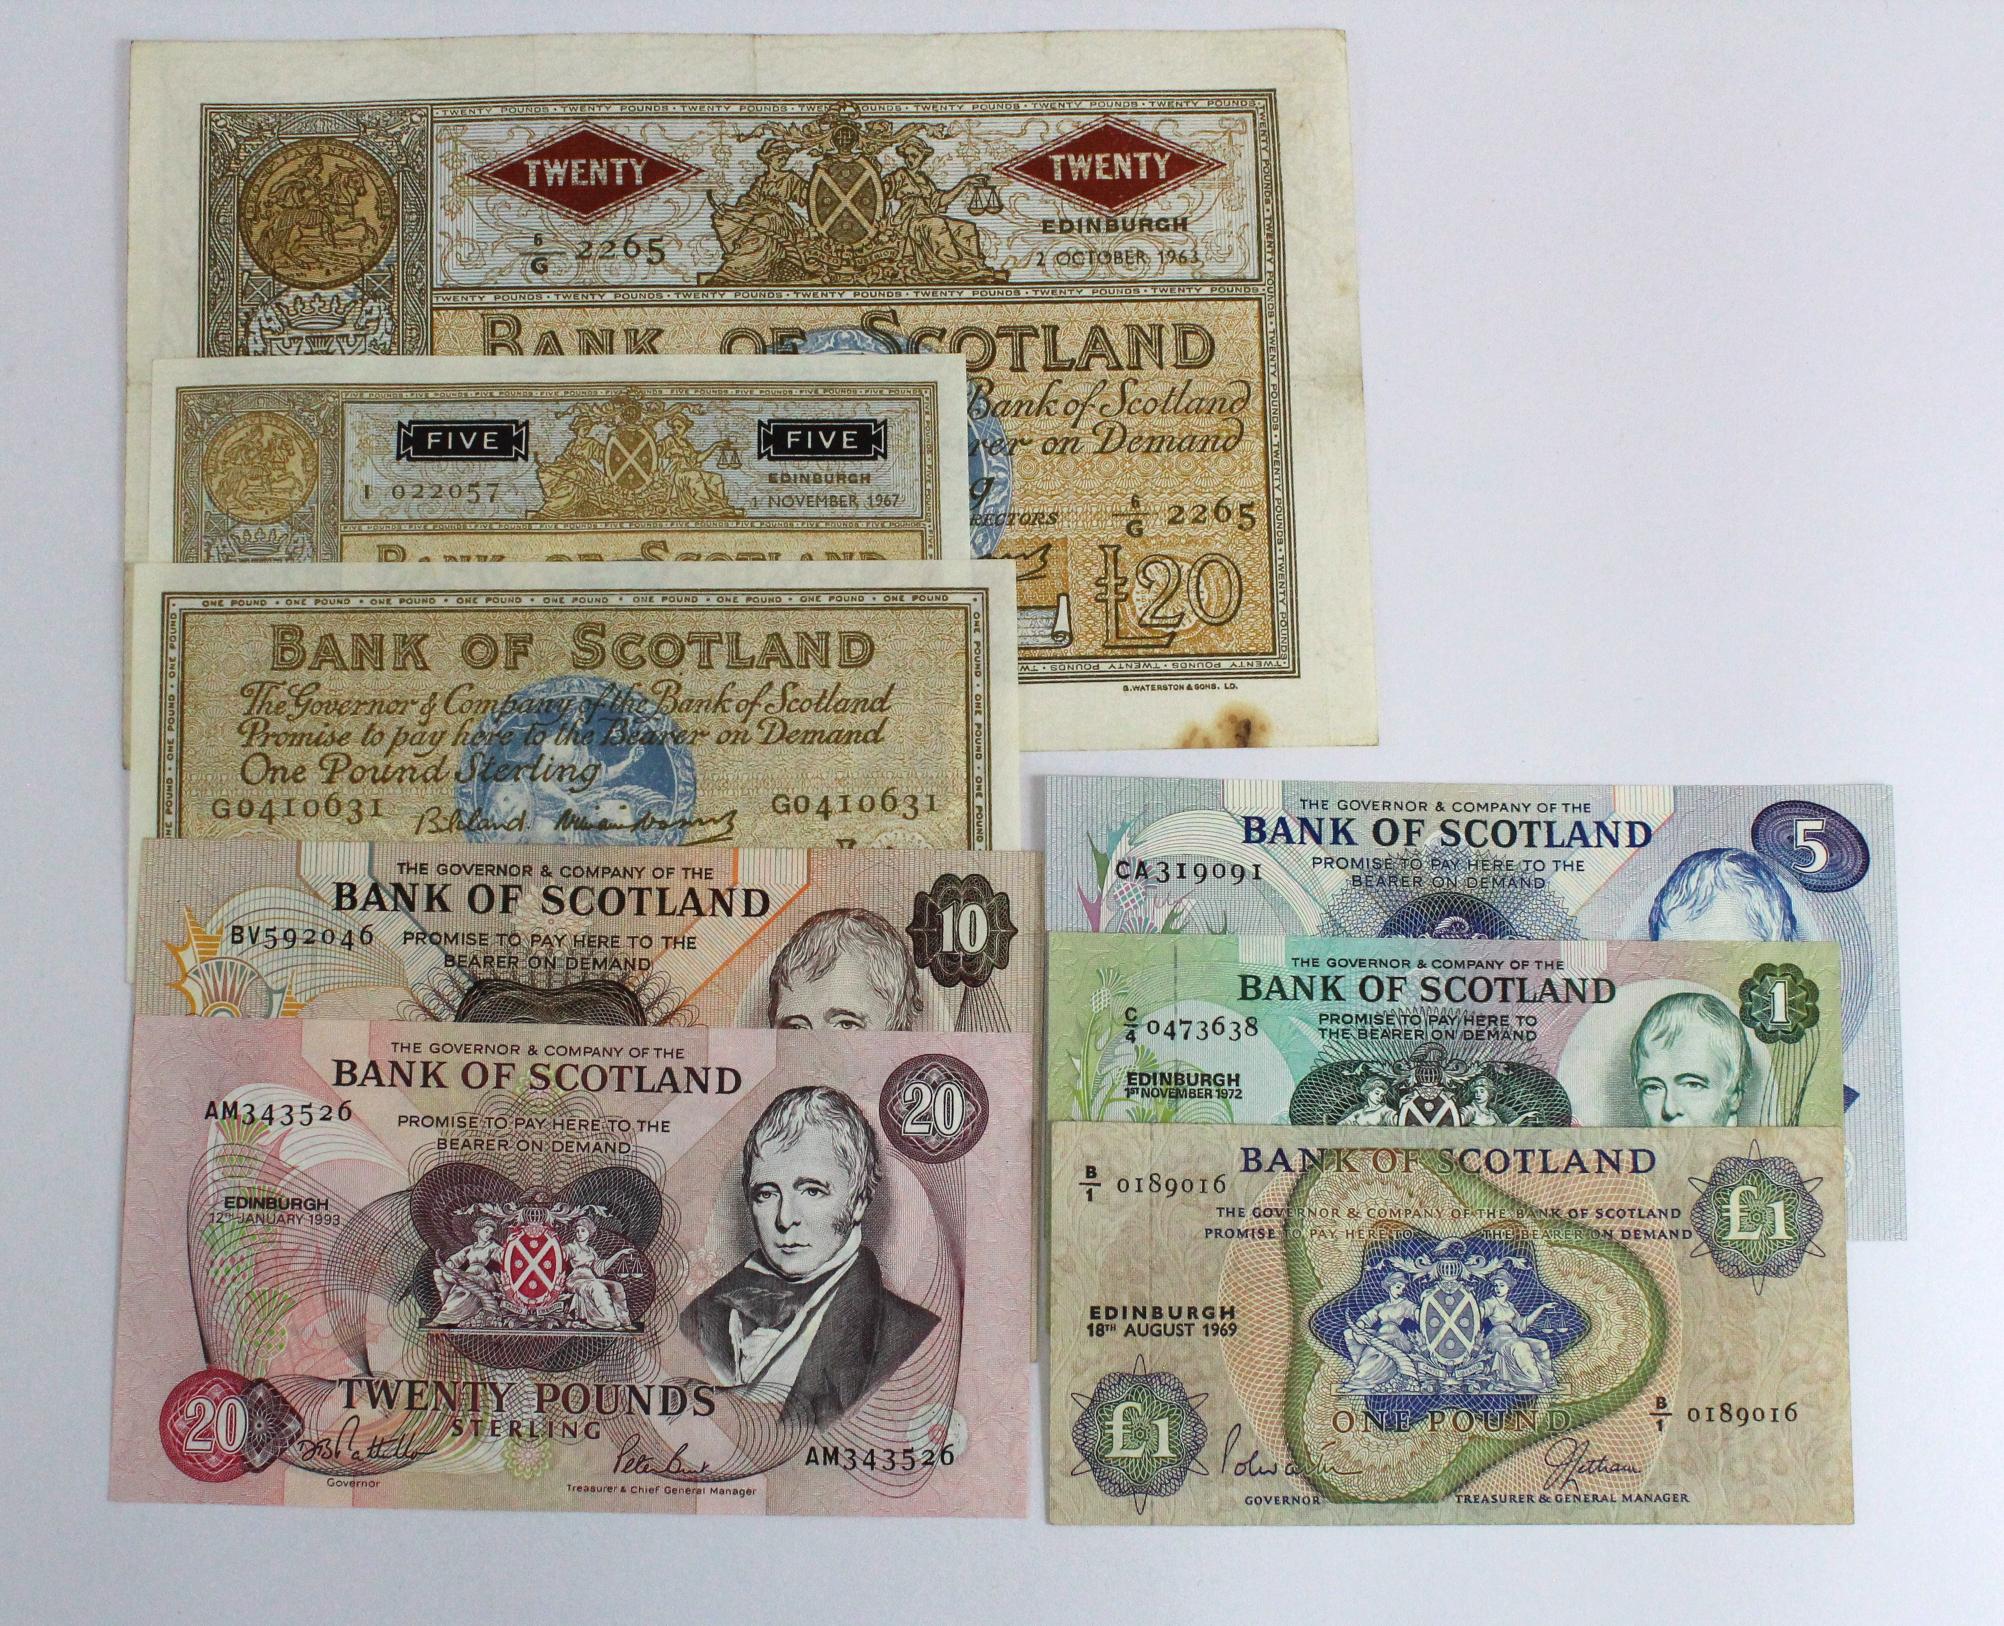 Scotland, Bank of Scotland (8), 20 Pounds dated 2nd October 1962, 5 Pounds dated 1st November